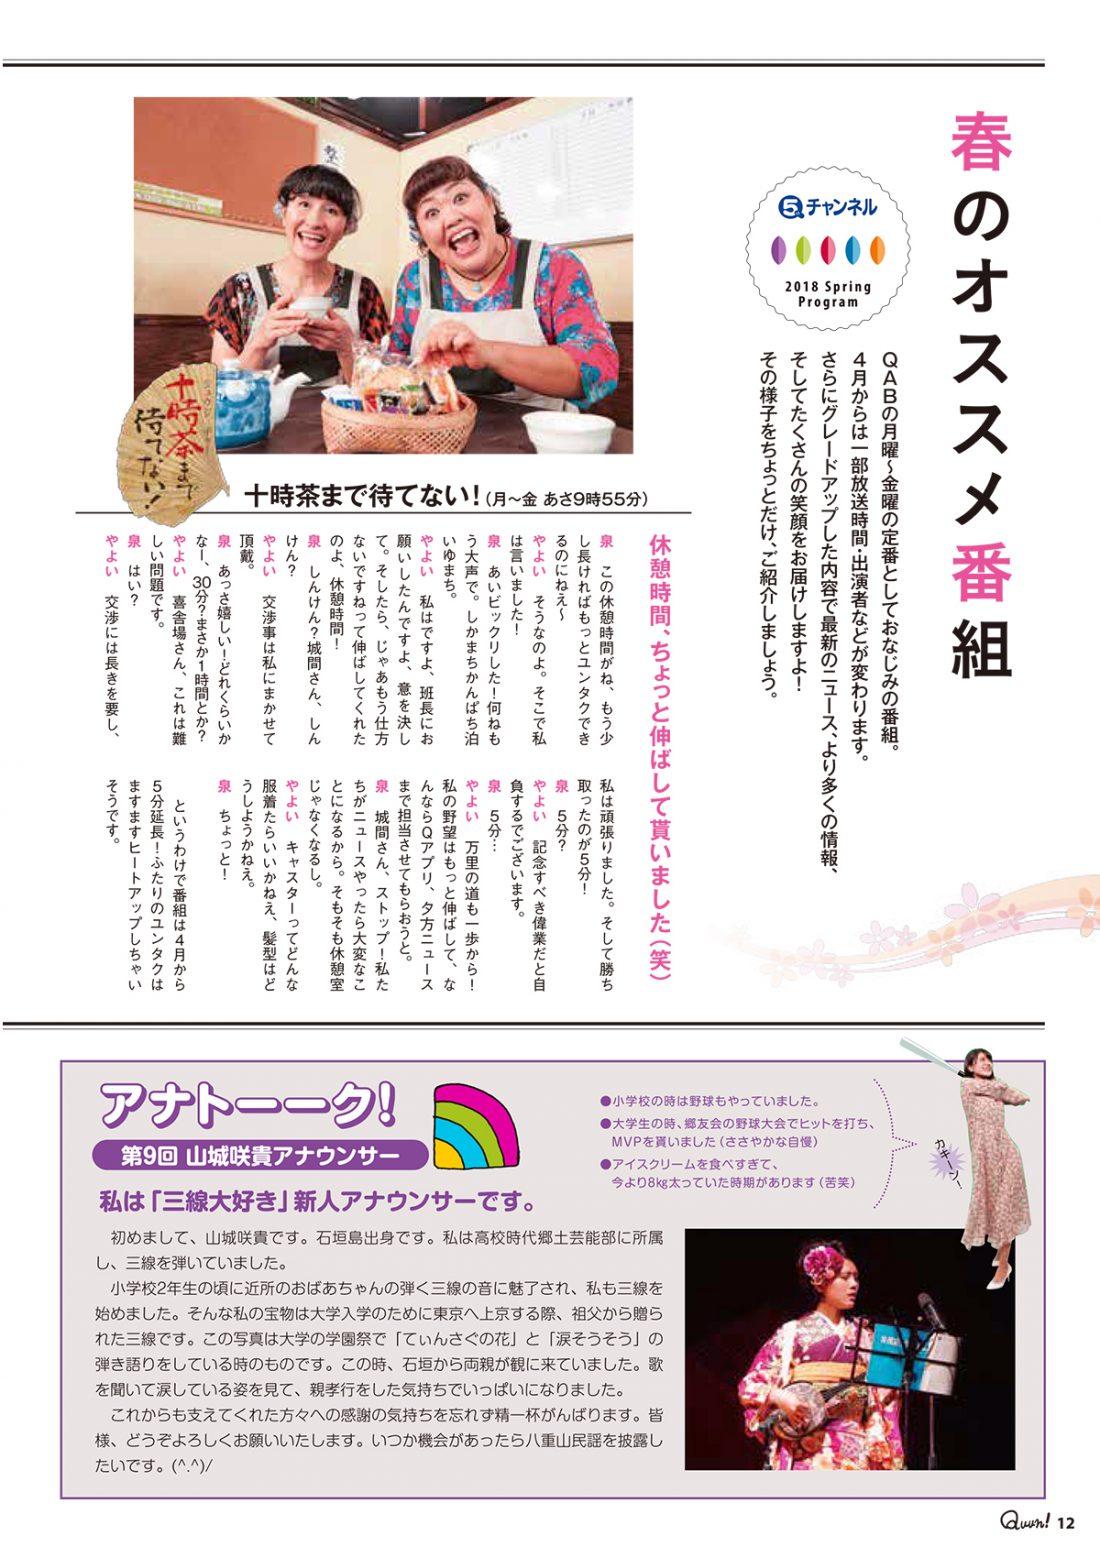 http://www.qab.co.jp/qgoro/wp-content/uploads/quun_0914-1100x1558.jpg